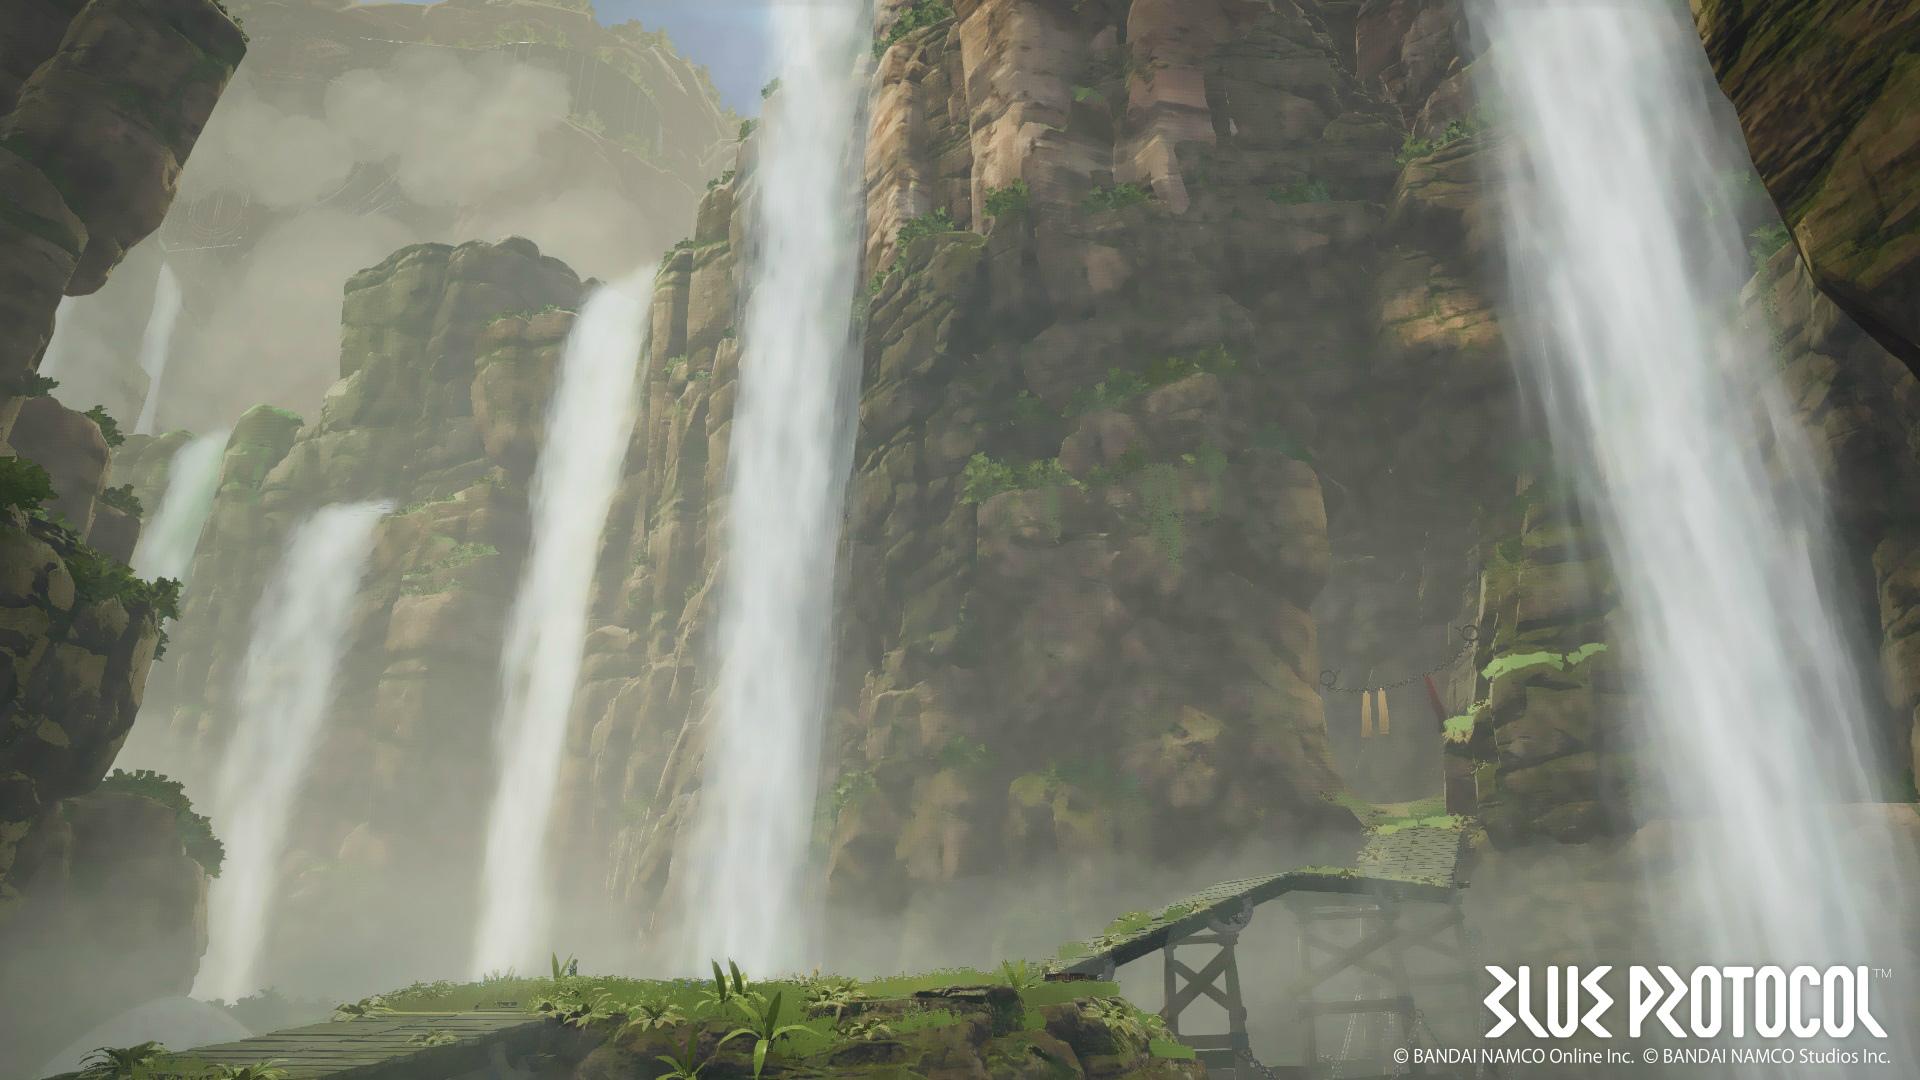 Дебютный трейлер MMORPG Blue Protocol от Bandai Namco